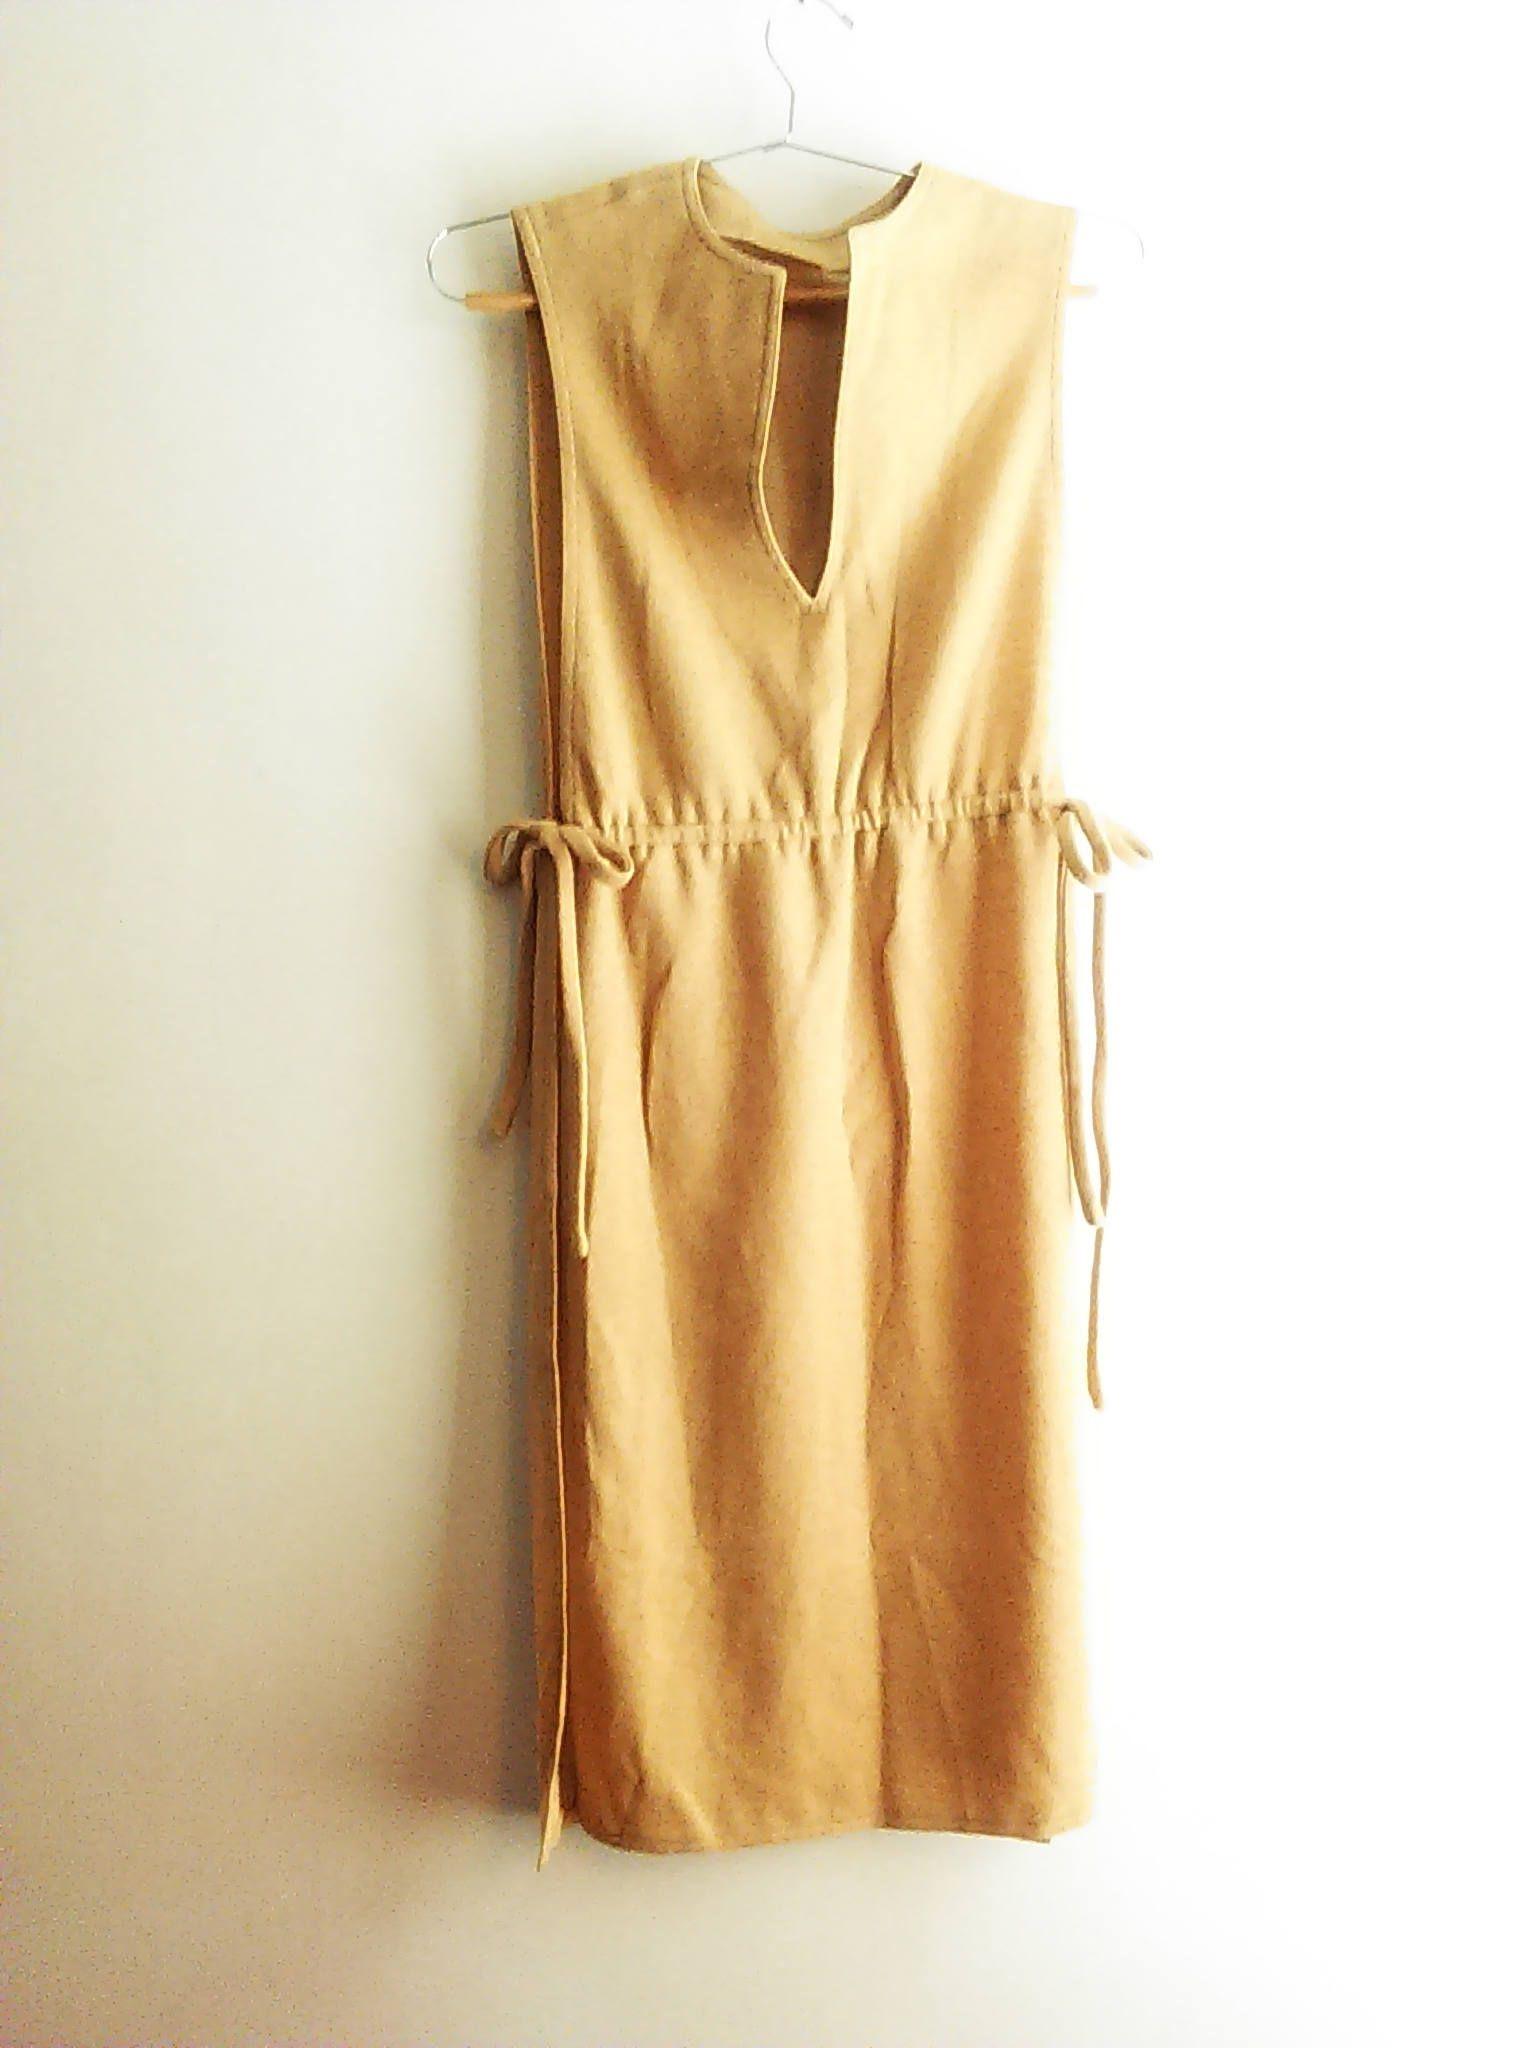 Vintage 70's Camel Midi Smock Dress / Open Sided Smock Dress W/ Ties / Layering Piece / Minimalist / Hippie / Retro / Women's Size S by JulesCristenVintage on Etsy